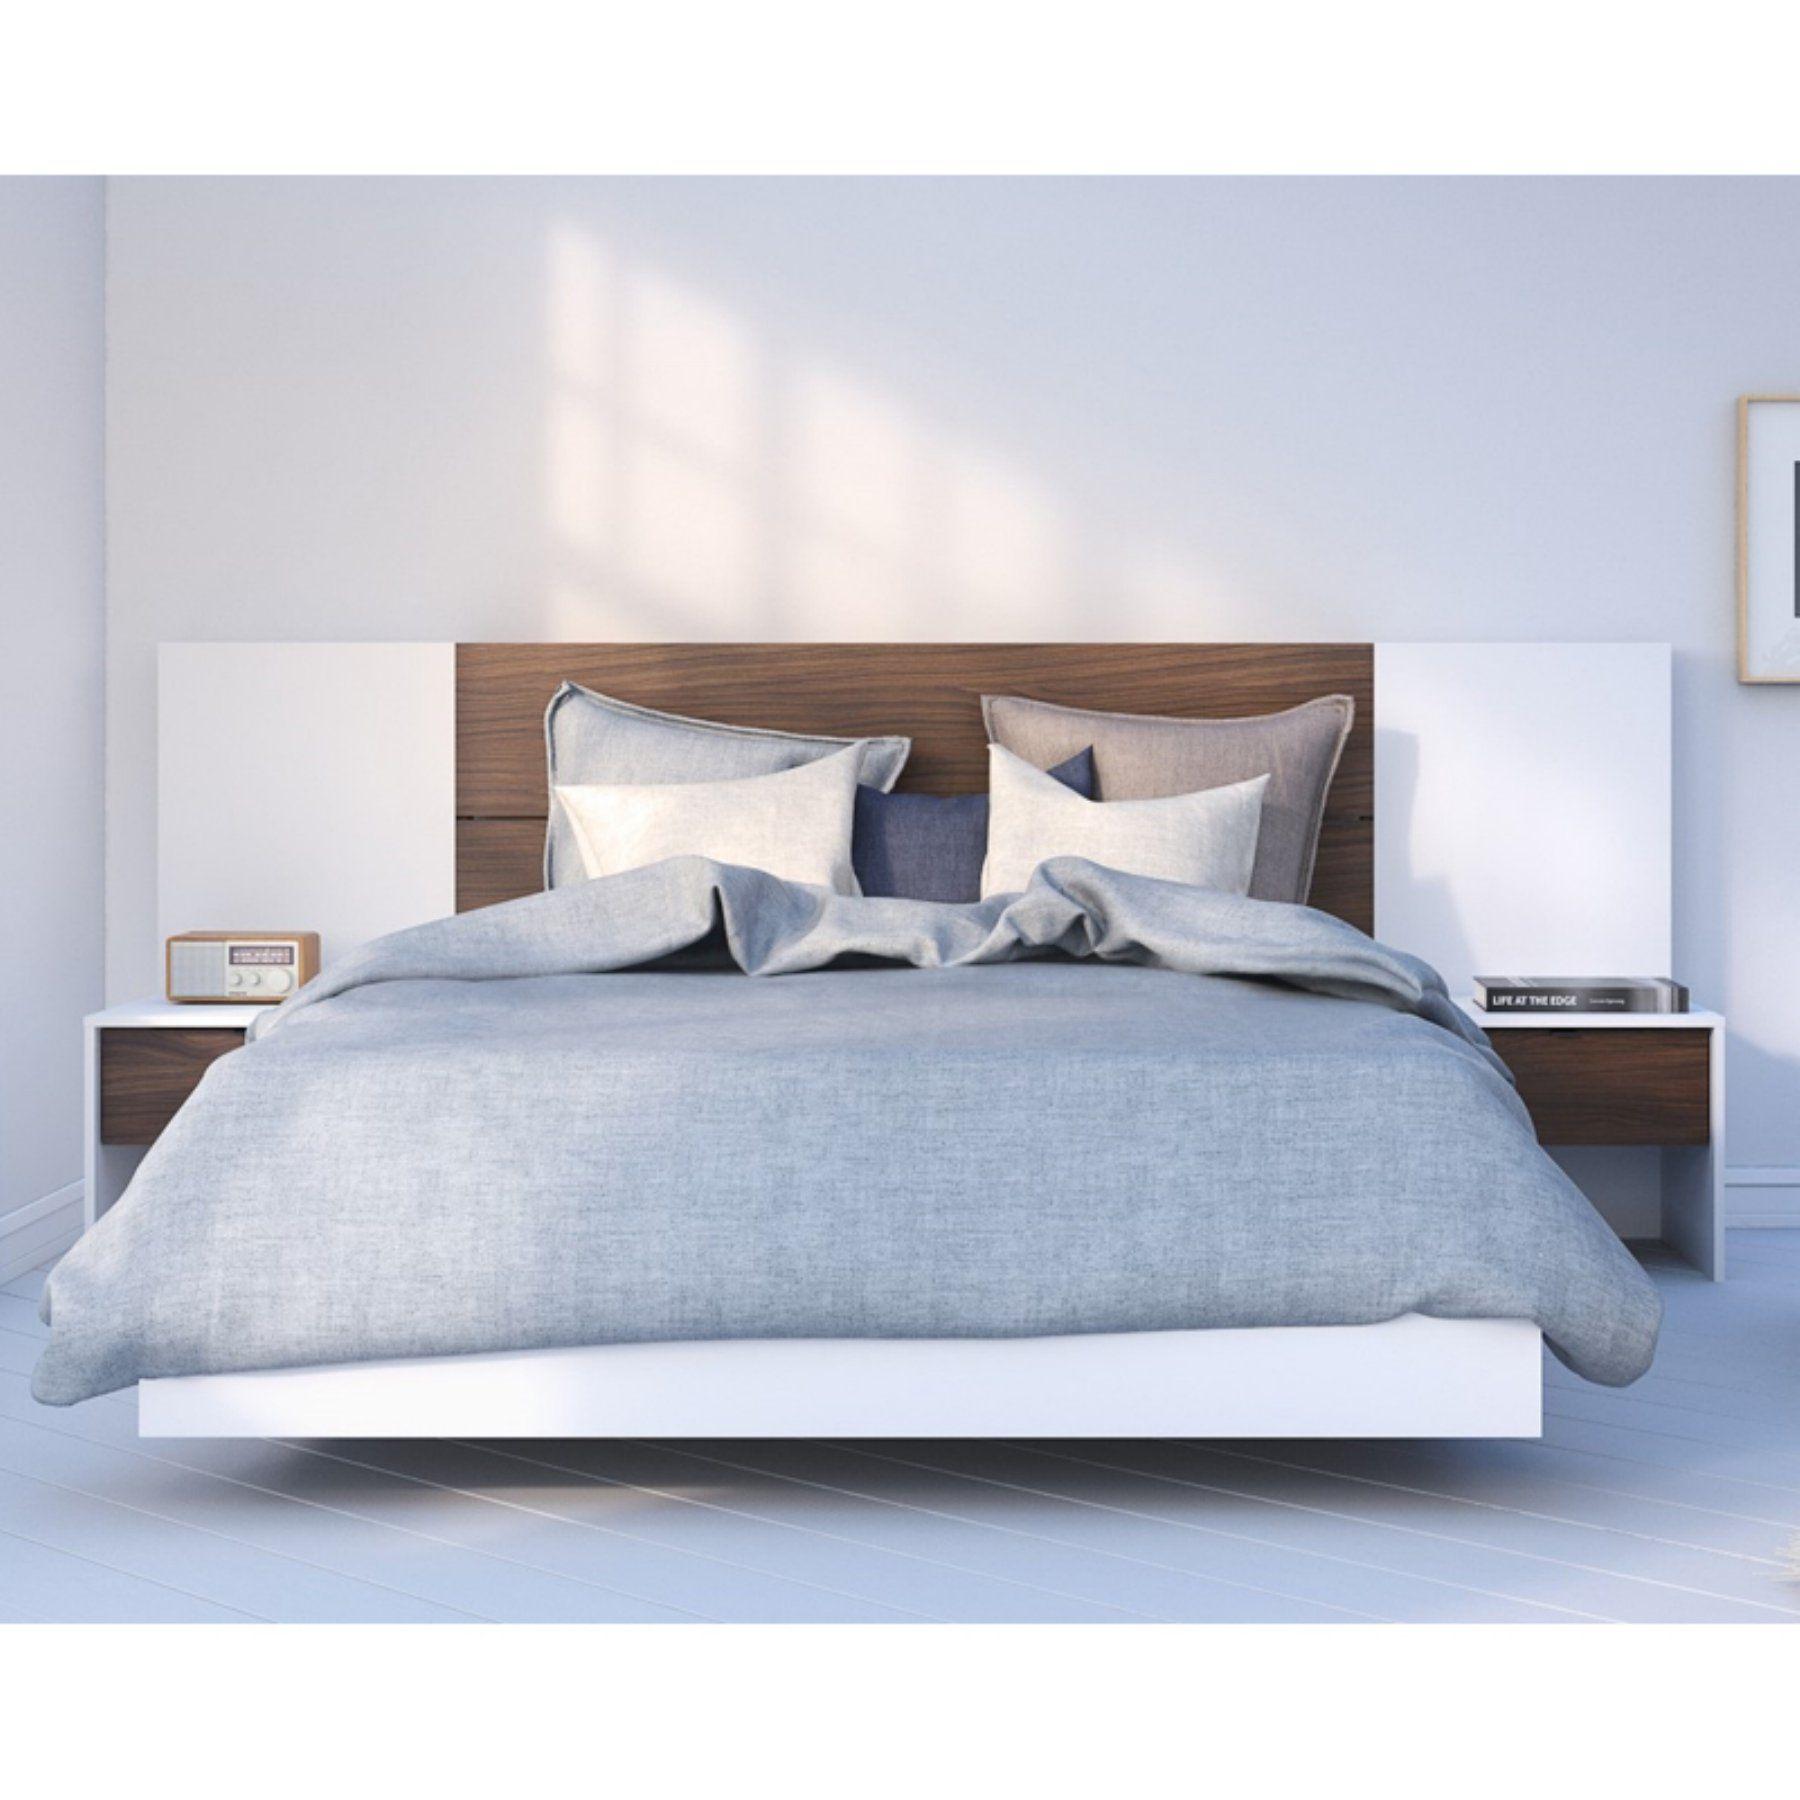 Nexera Celebri T Plank Effect Platform Bed With Headboard Extension Panels